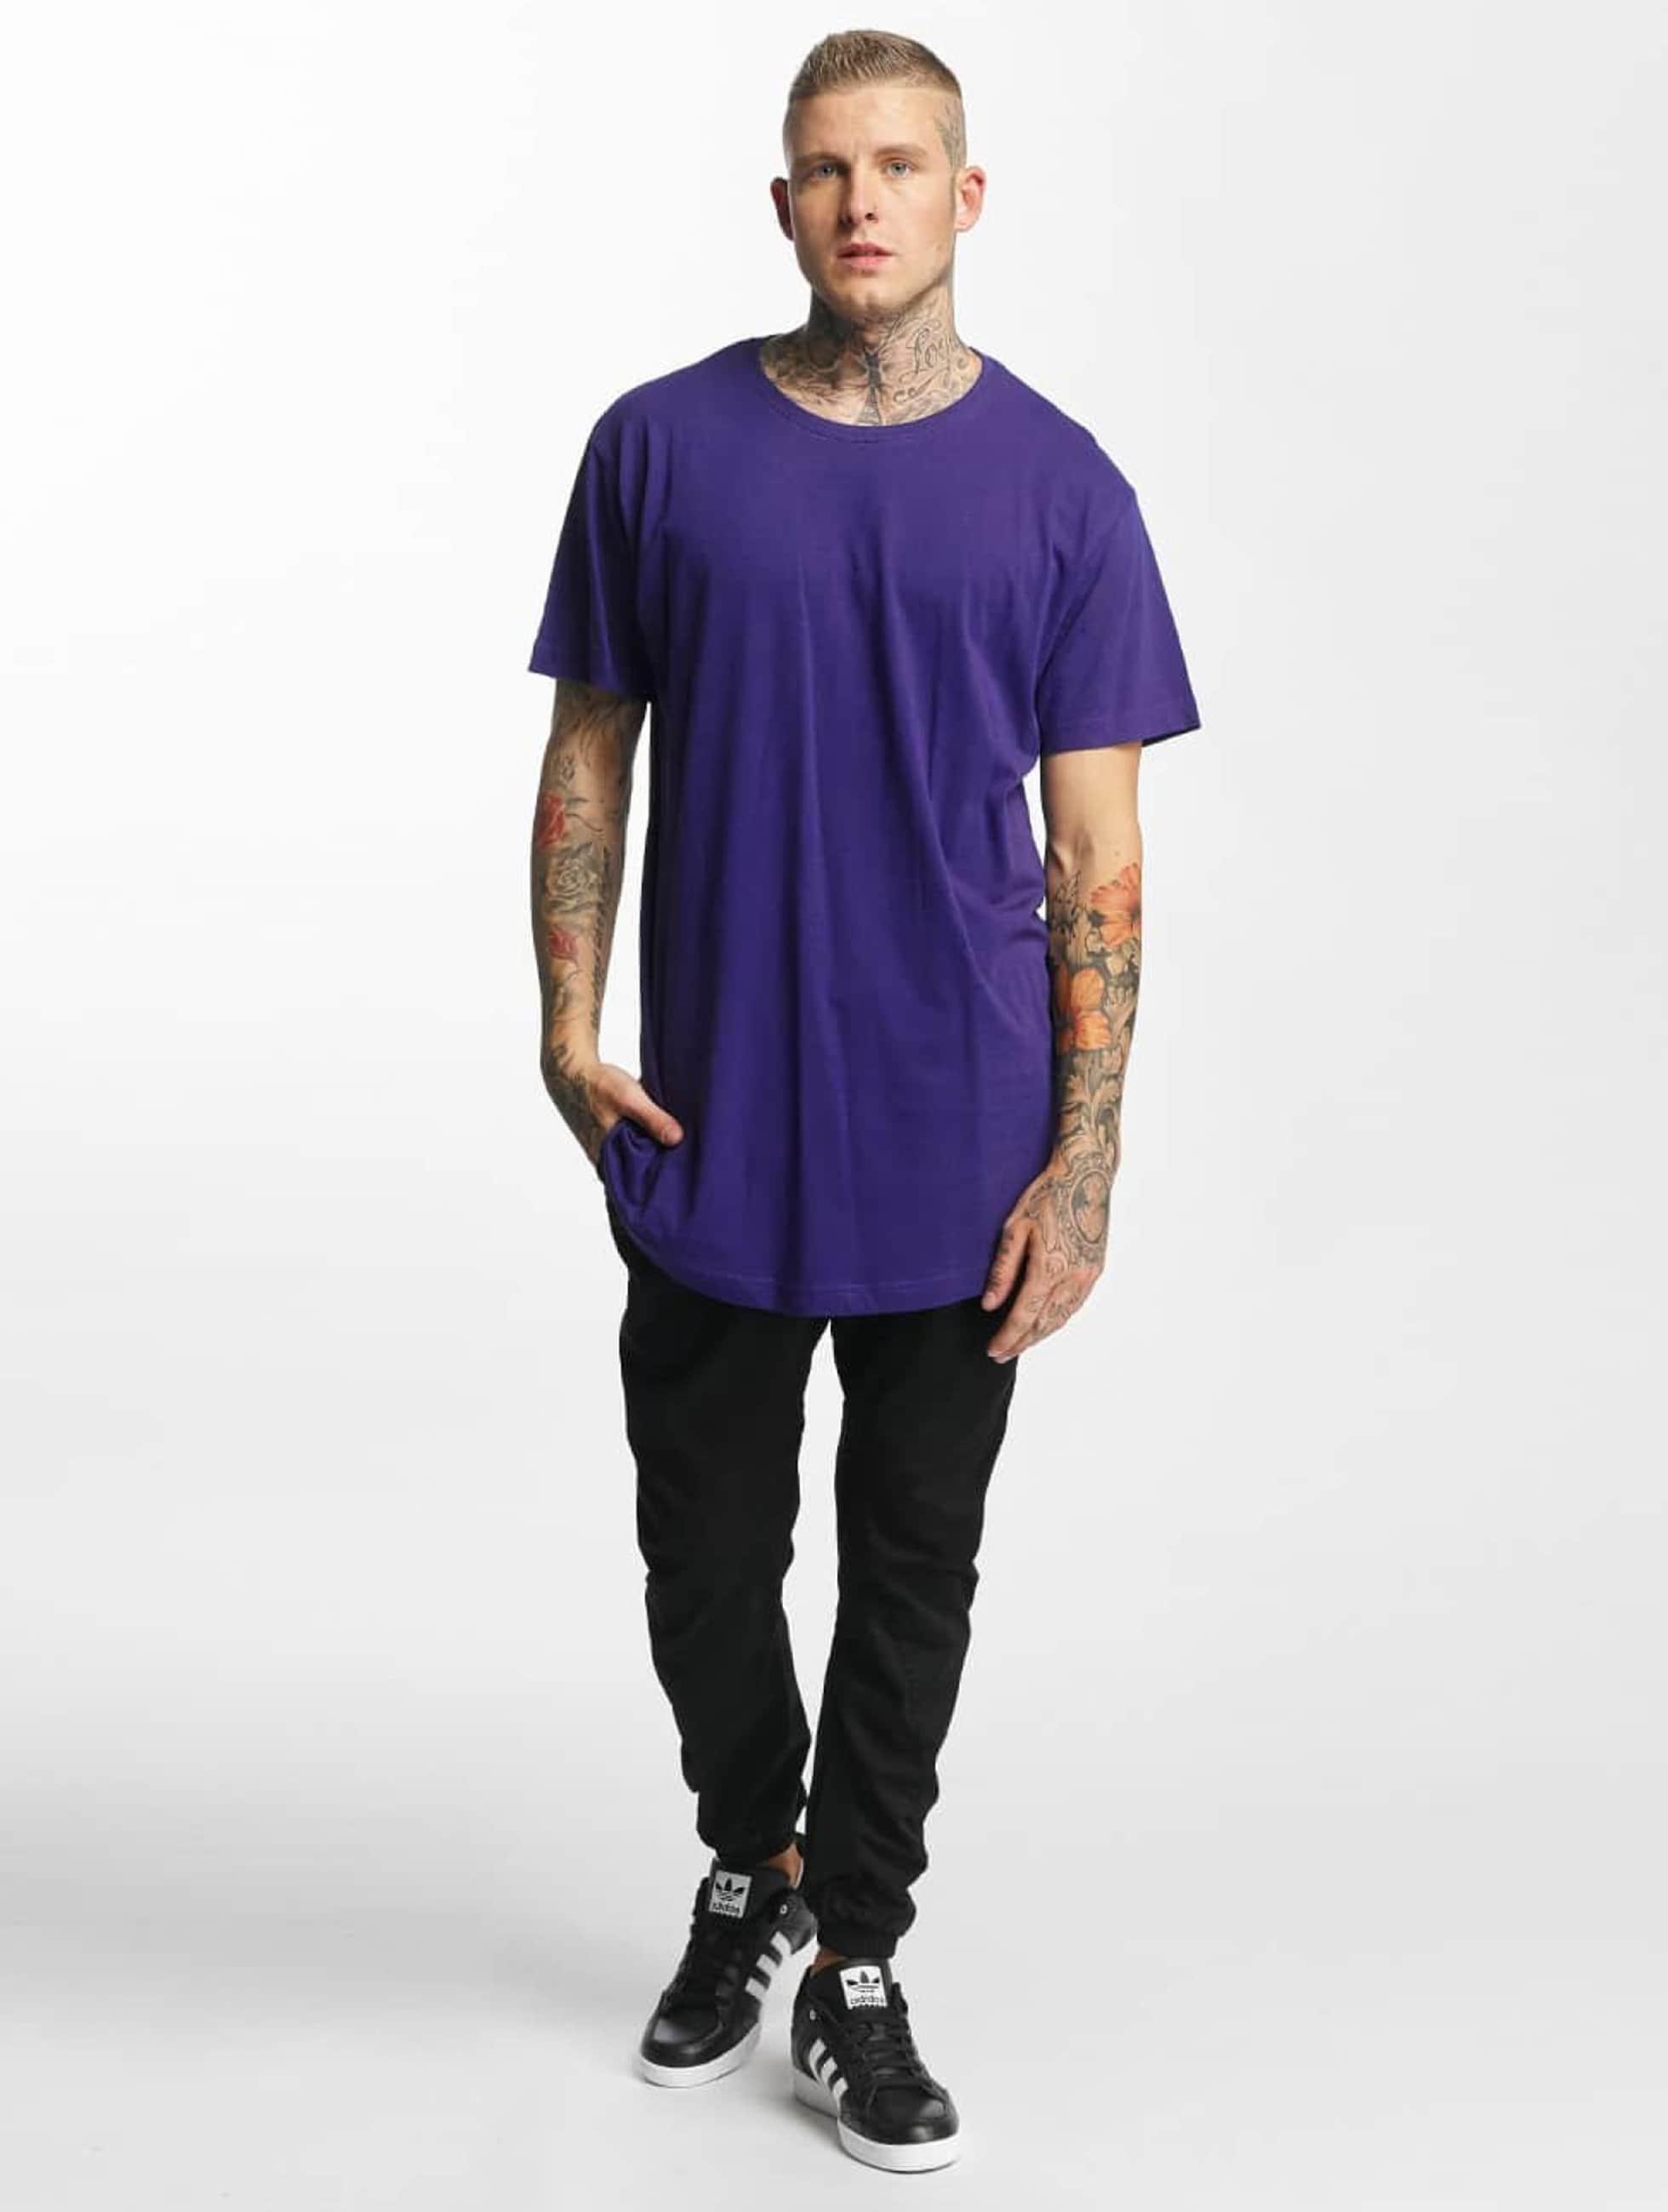 Urban Classics Tall Tees Shaped Oversized Long purple